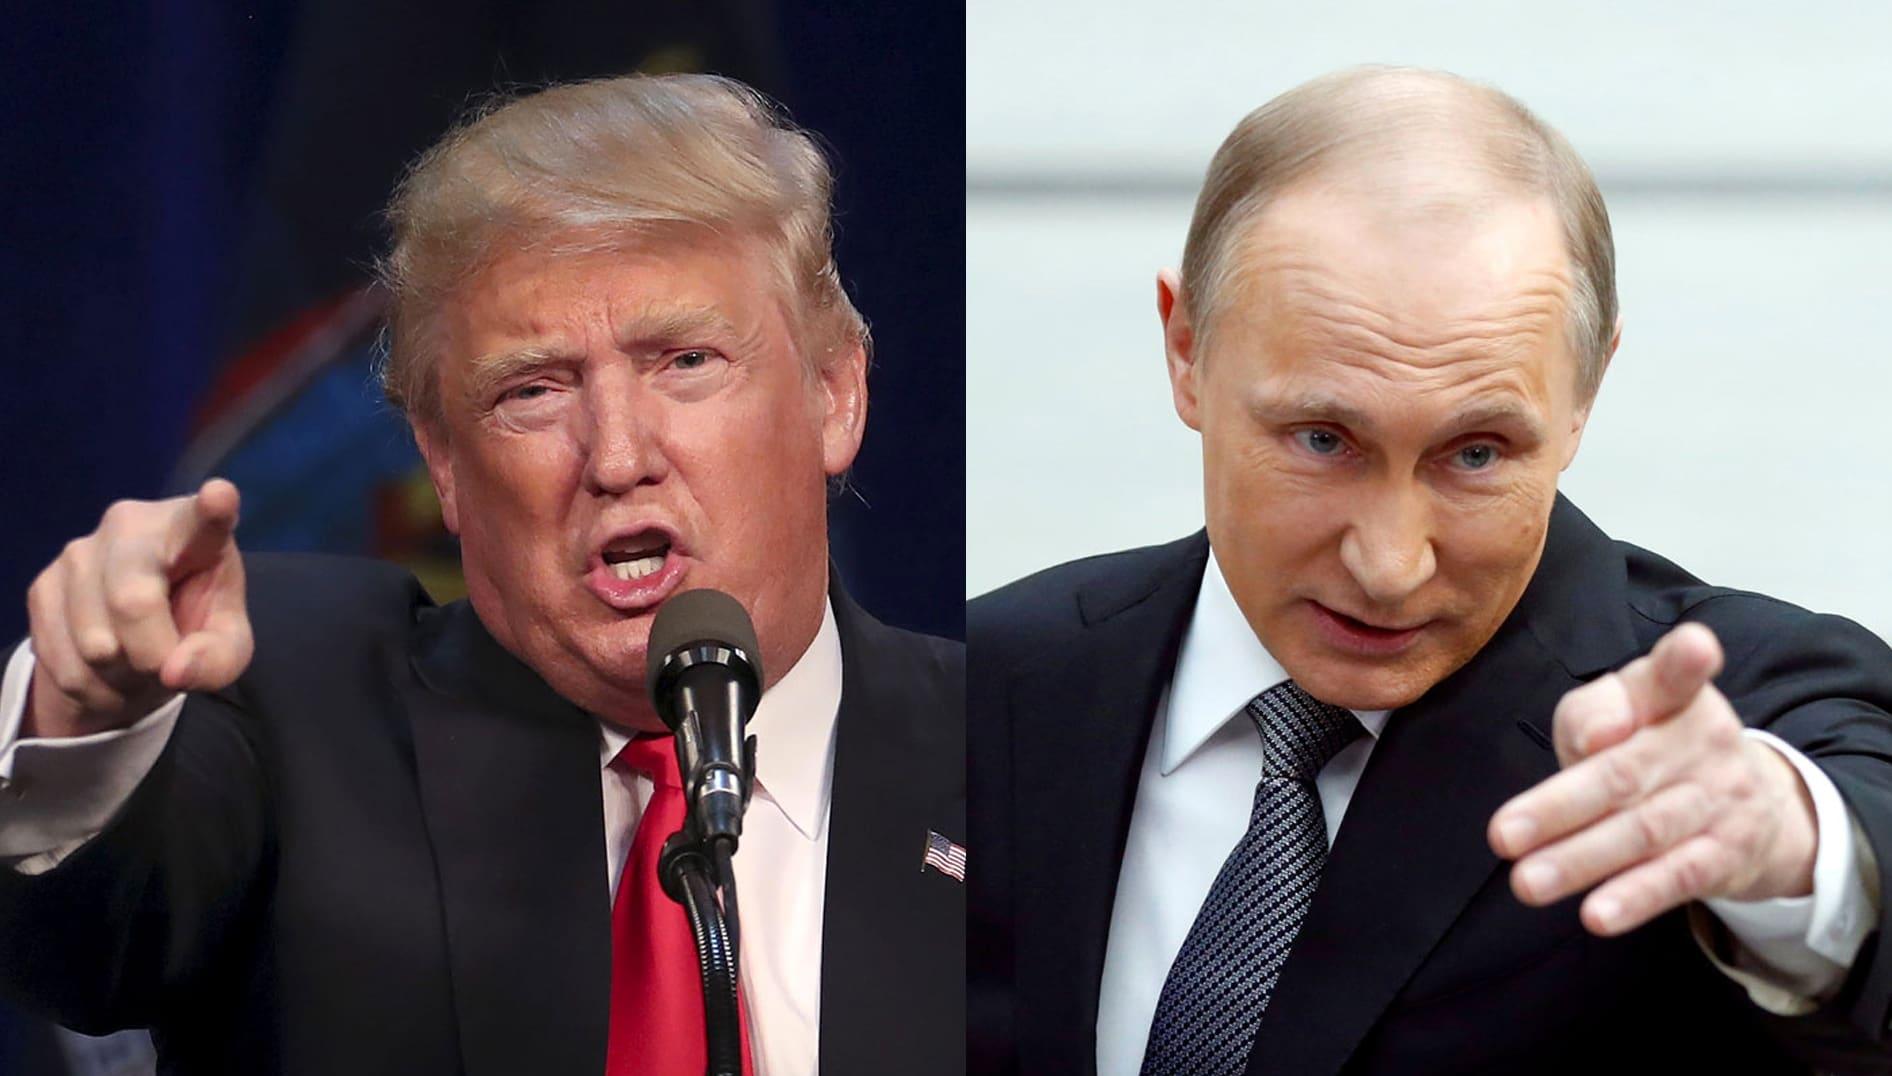 U.S. President Donald Trump (left) and Russian President Vladimir Putin (Photos: Carlo Allegri/Reuters; Maxim Shemetov/Reuters)